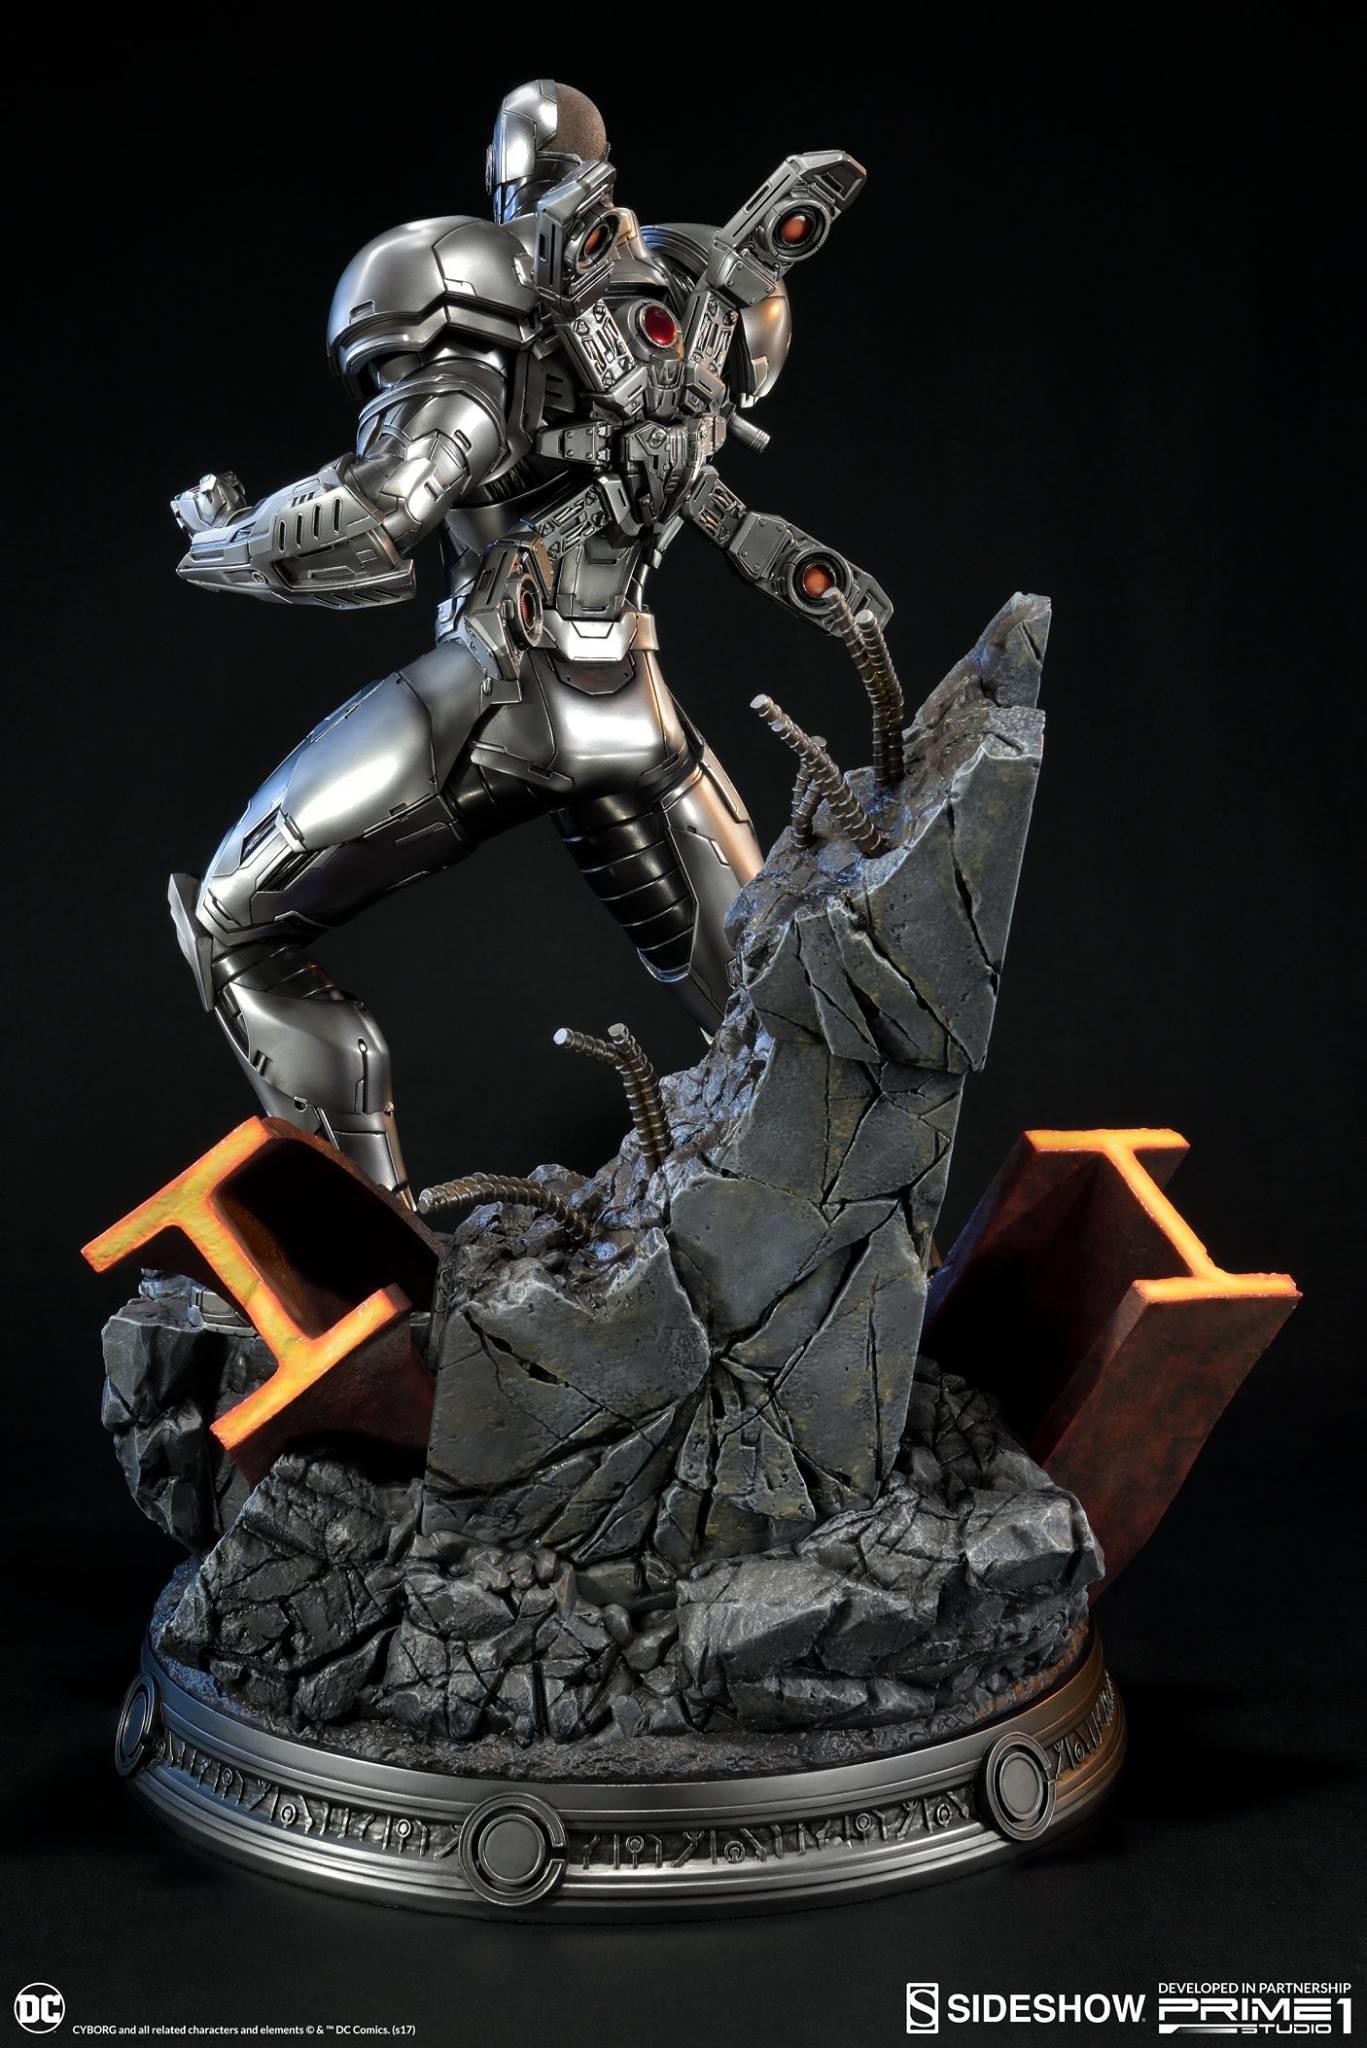 Adam fisher prime 1 studio dc cyborg statue 006